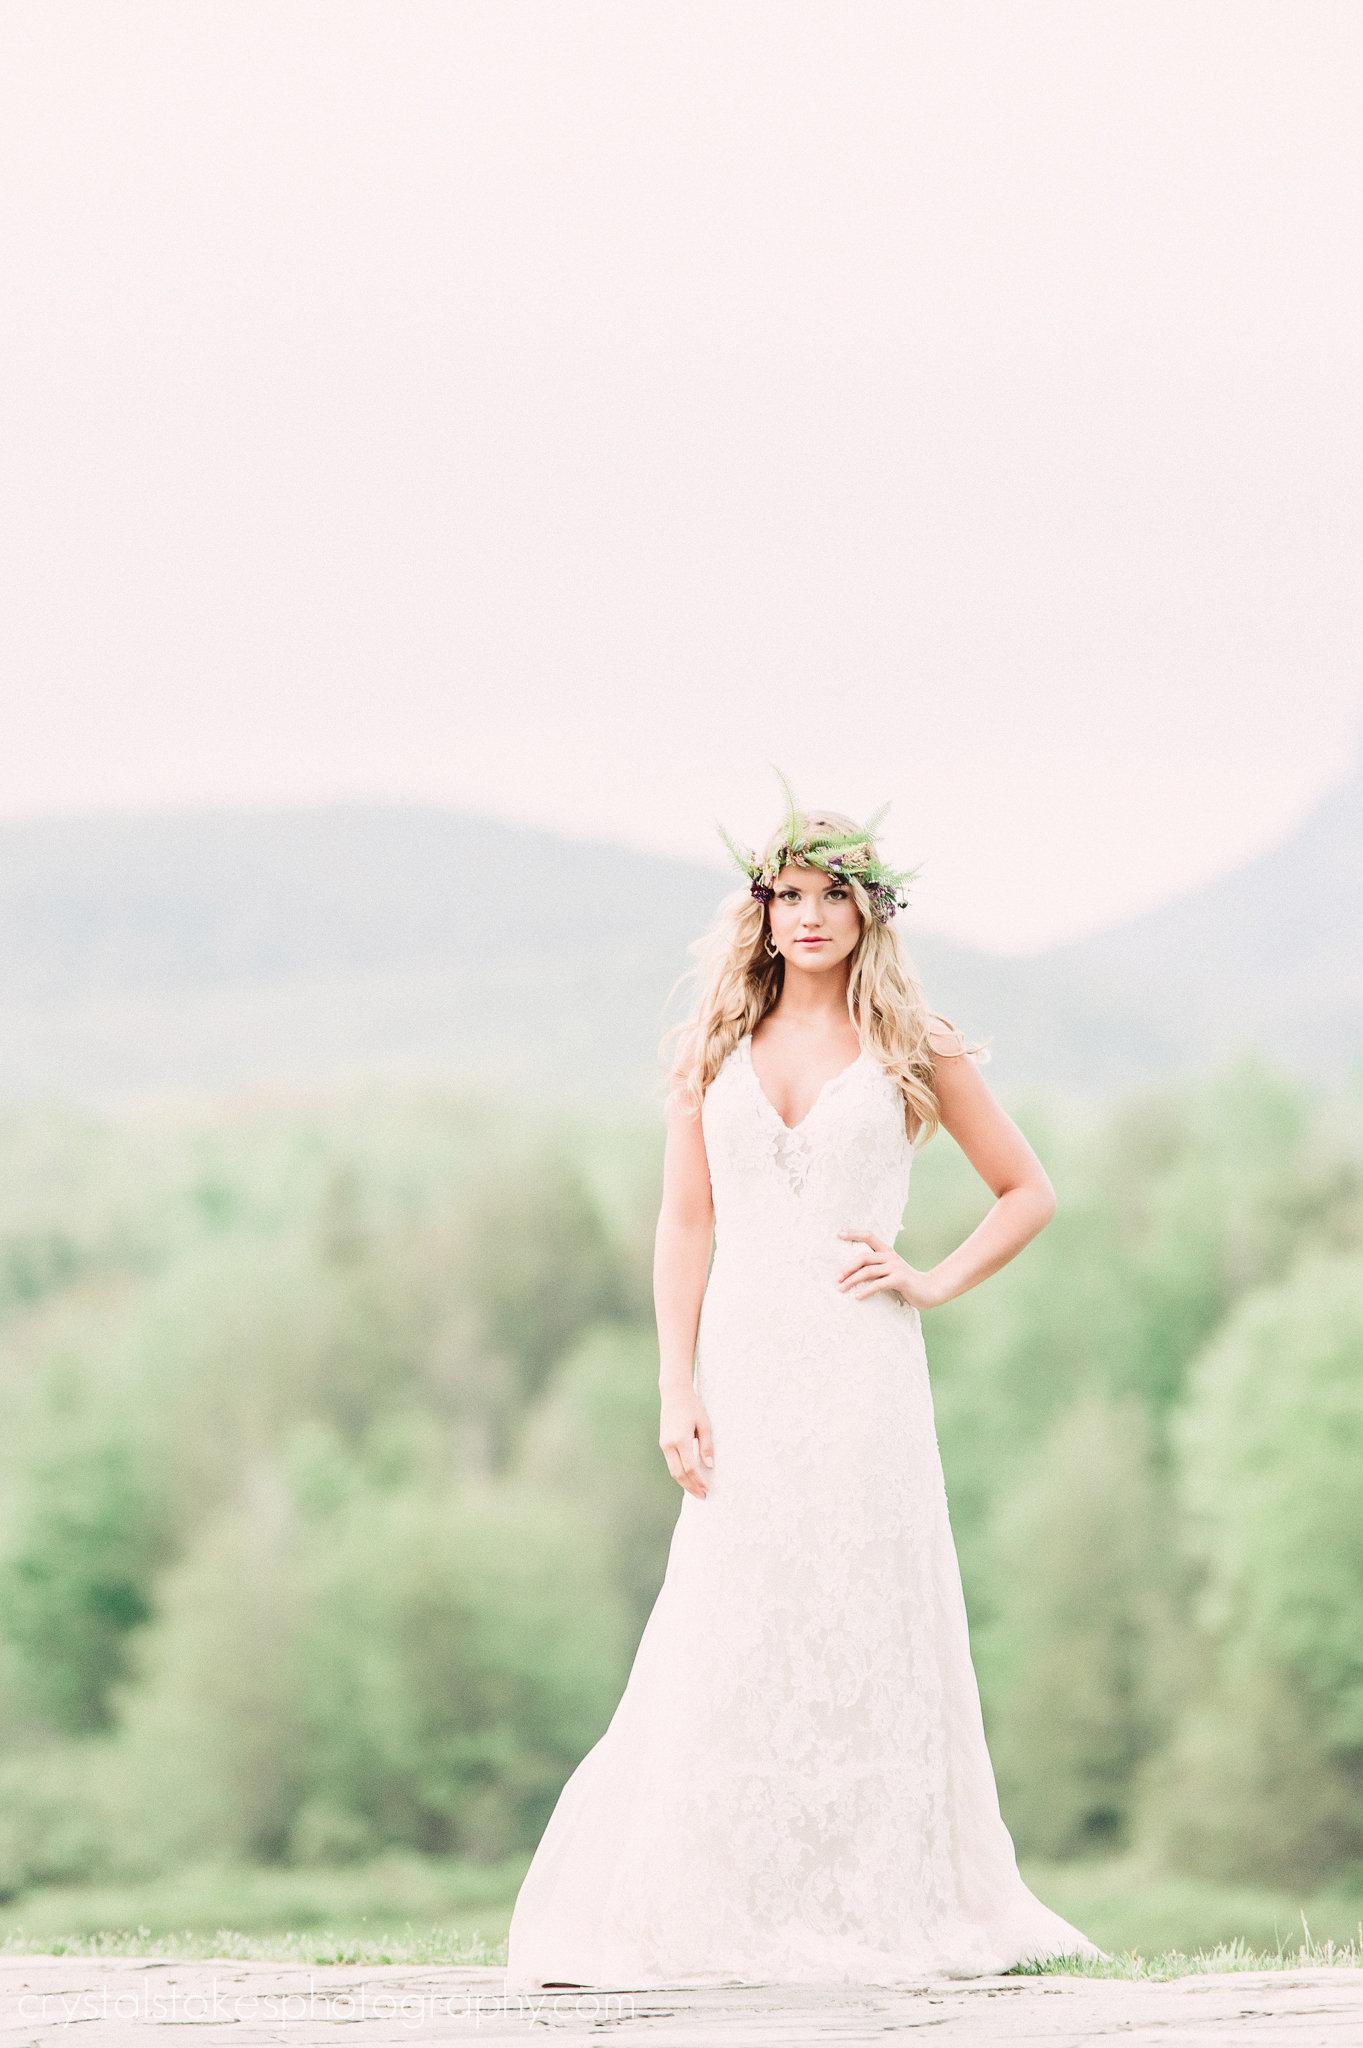 Boho_Mountain_Wedding_Inspiration.jpg